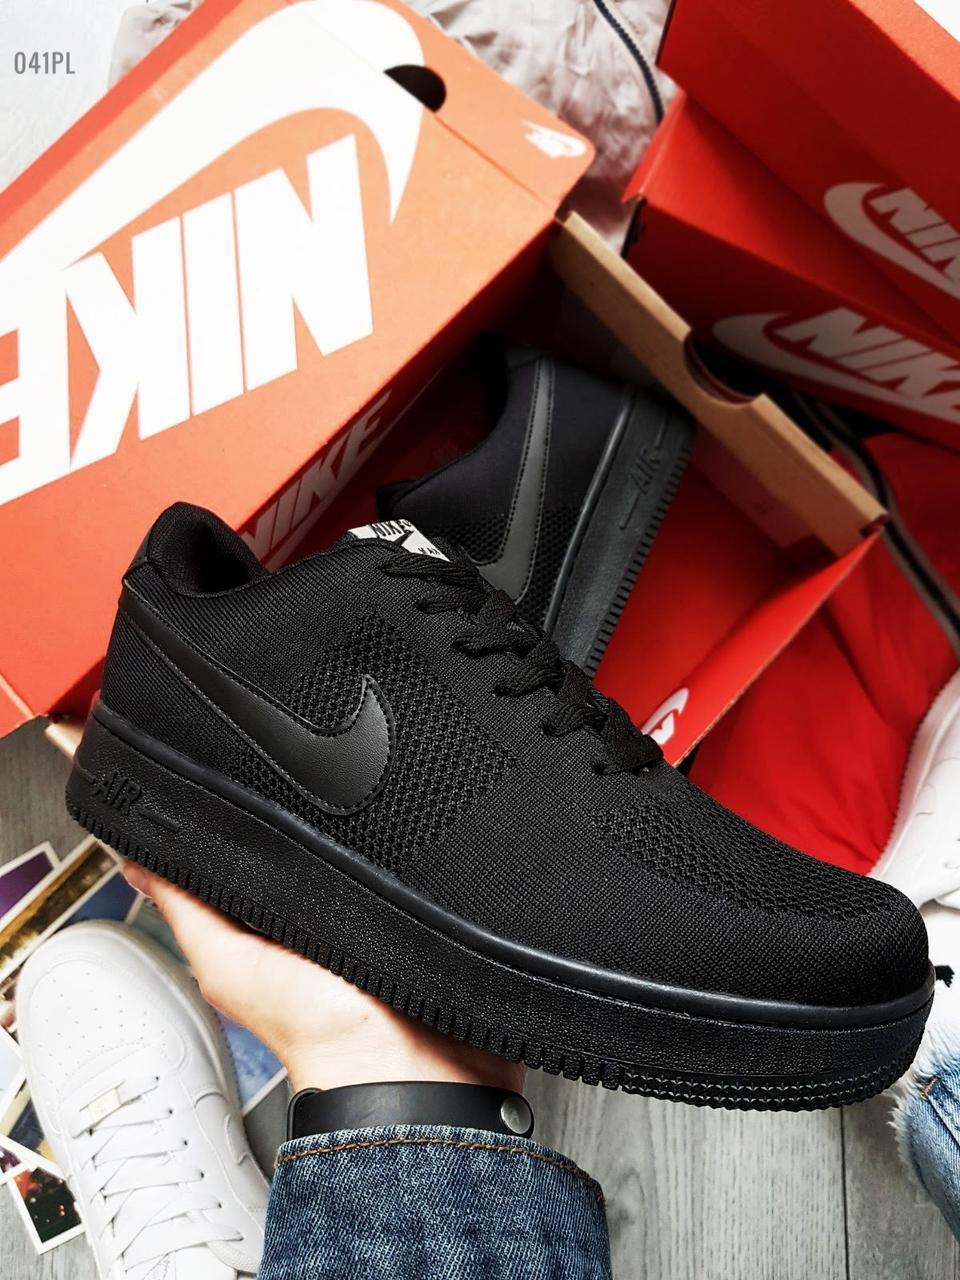 Мужские кроссовки Nike Air Force Flyknit Low Black (р. 42, 42.5, 43)